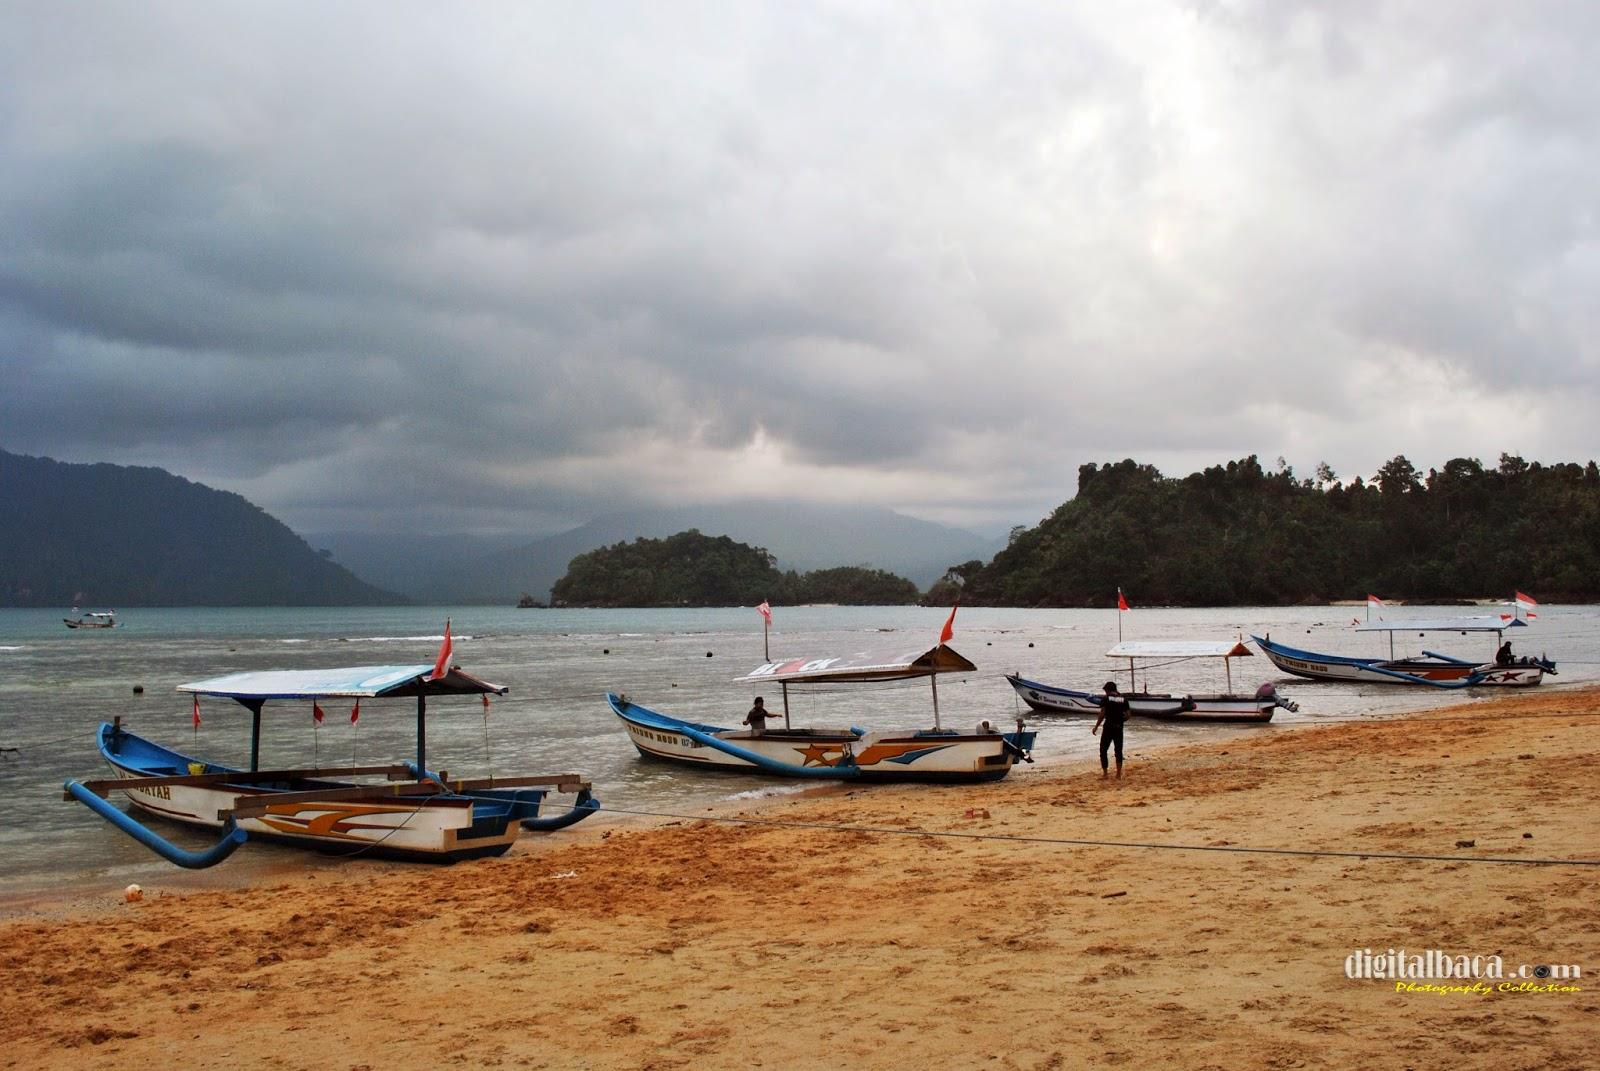 Pasir Putih Pantai Prigi Trenggalek Jawa Timur Digital Baca Kab